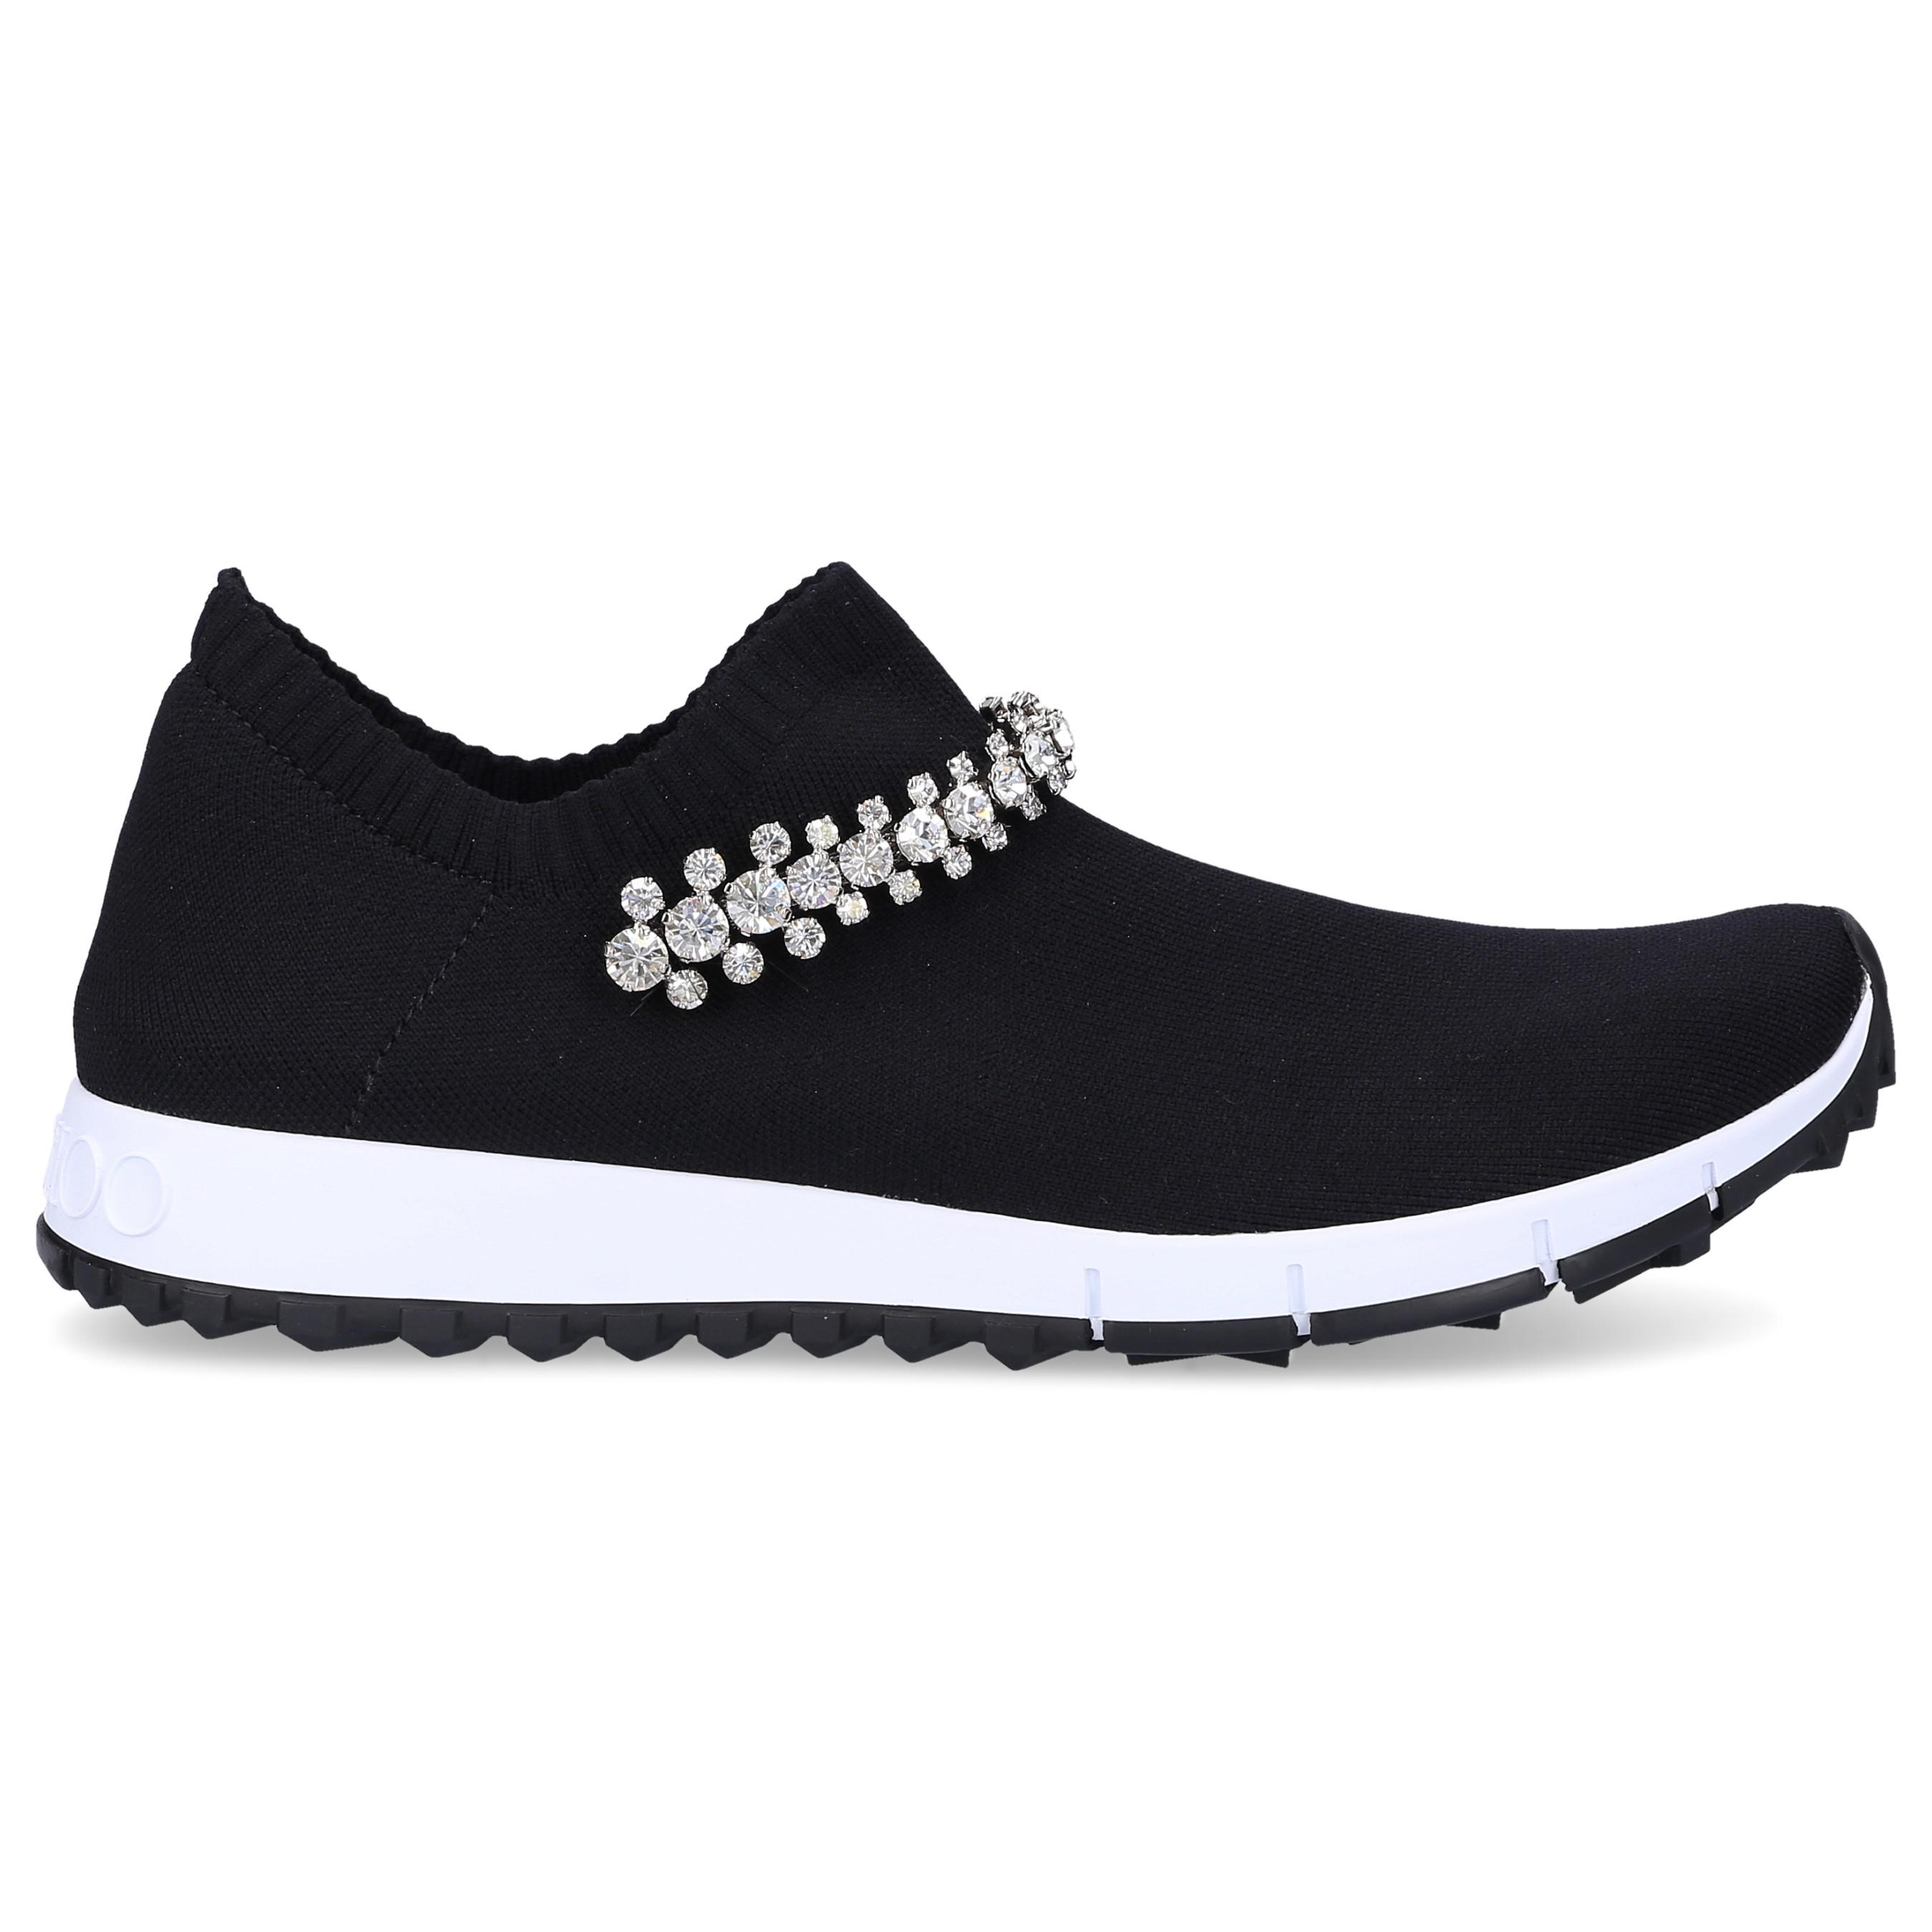 Jimmy Choo Sneaker low VERONA Baumwolle Polyamid Polyester Swarovski schwarz